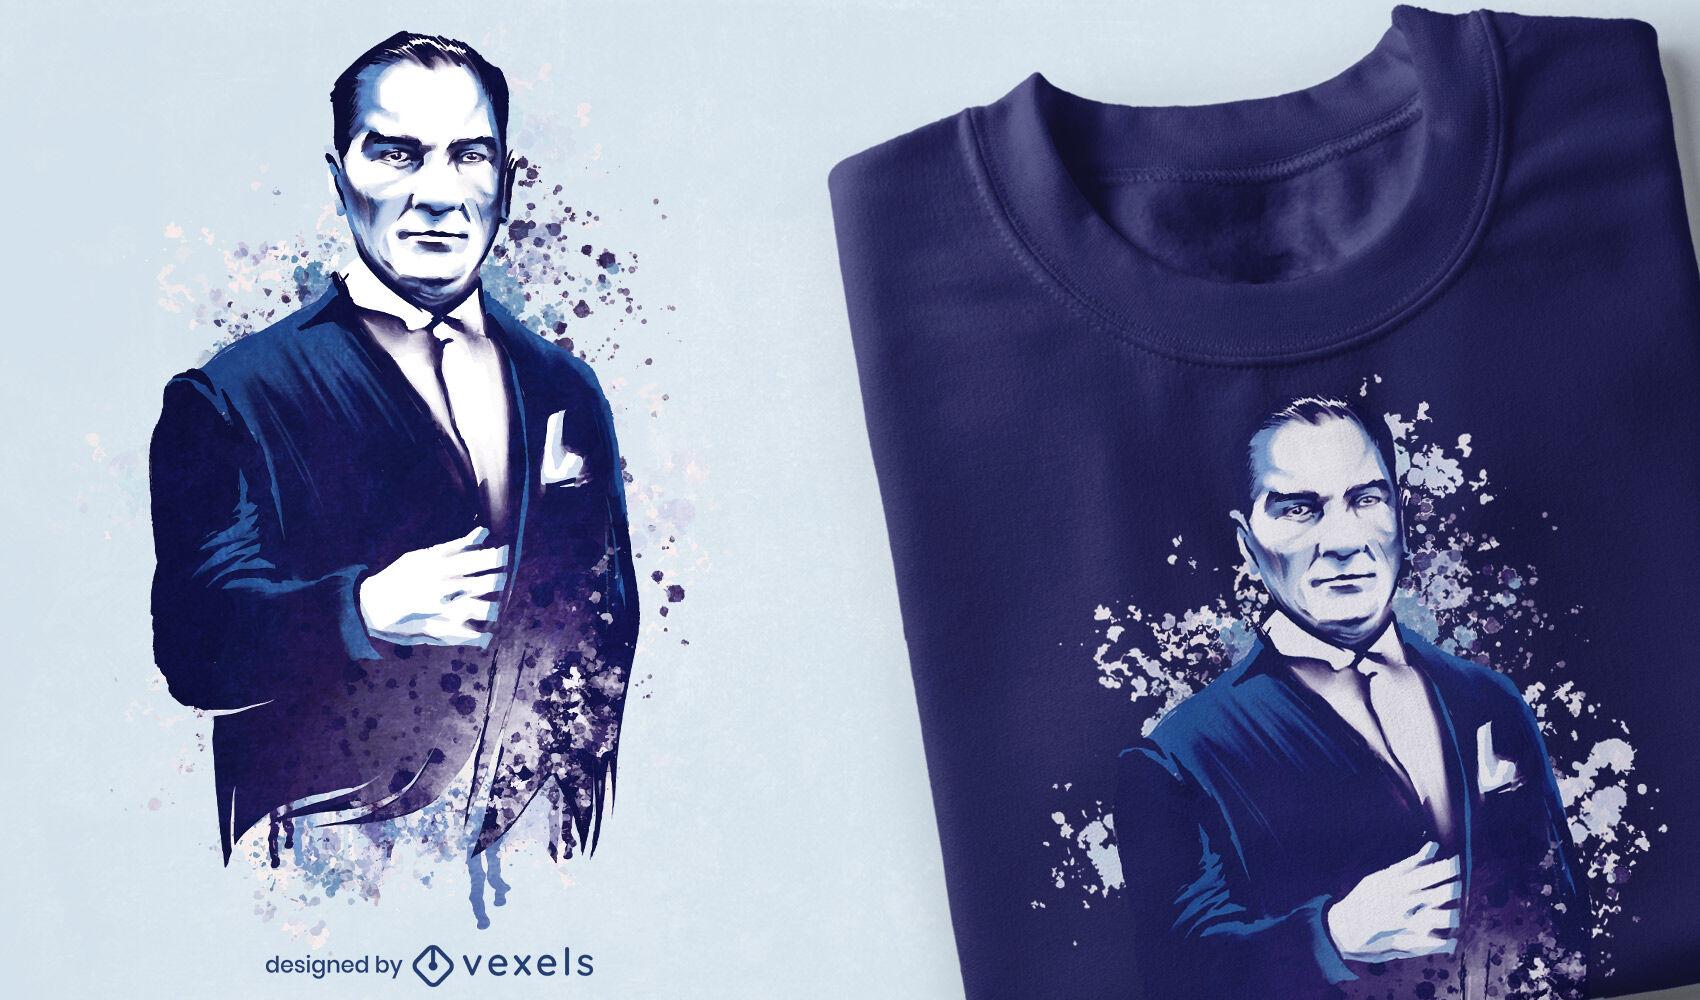 Atat?rk-Portr?t-PSD-T-Shirt-Design